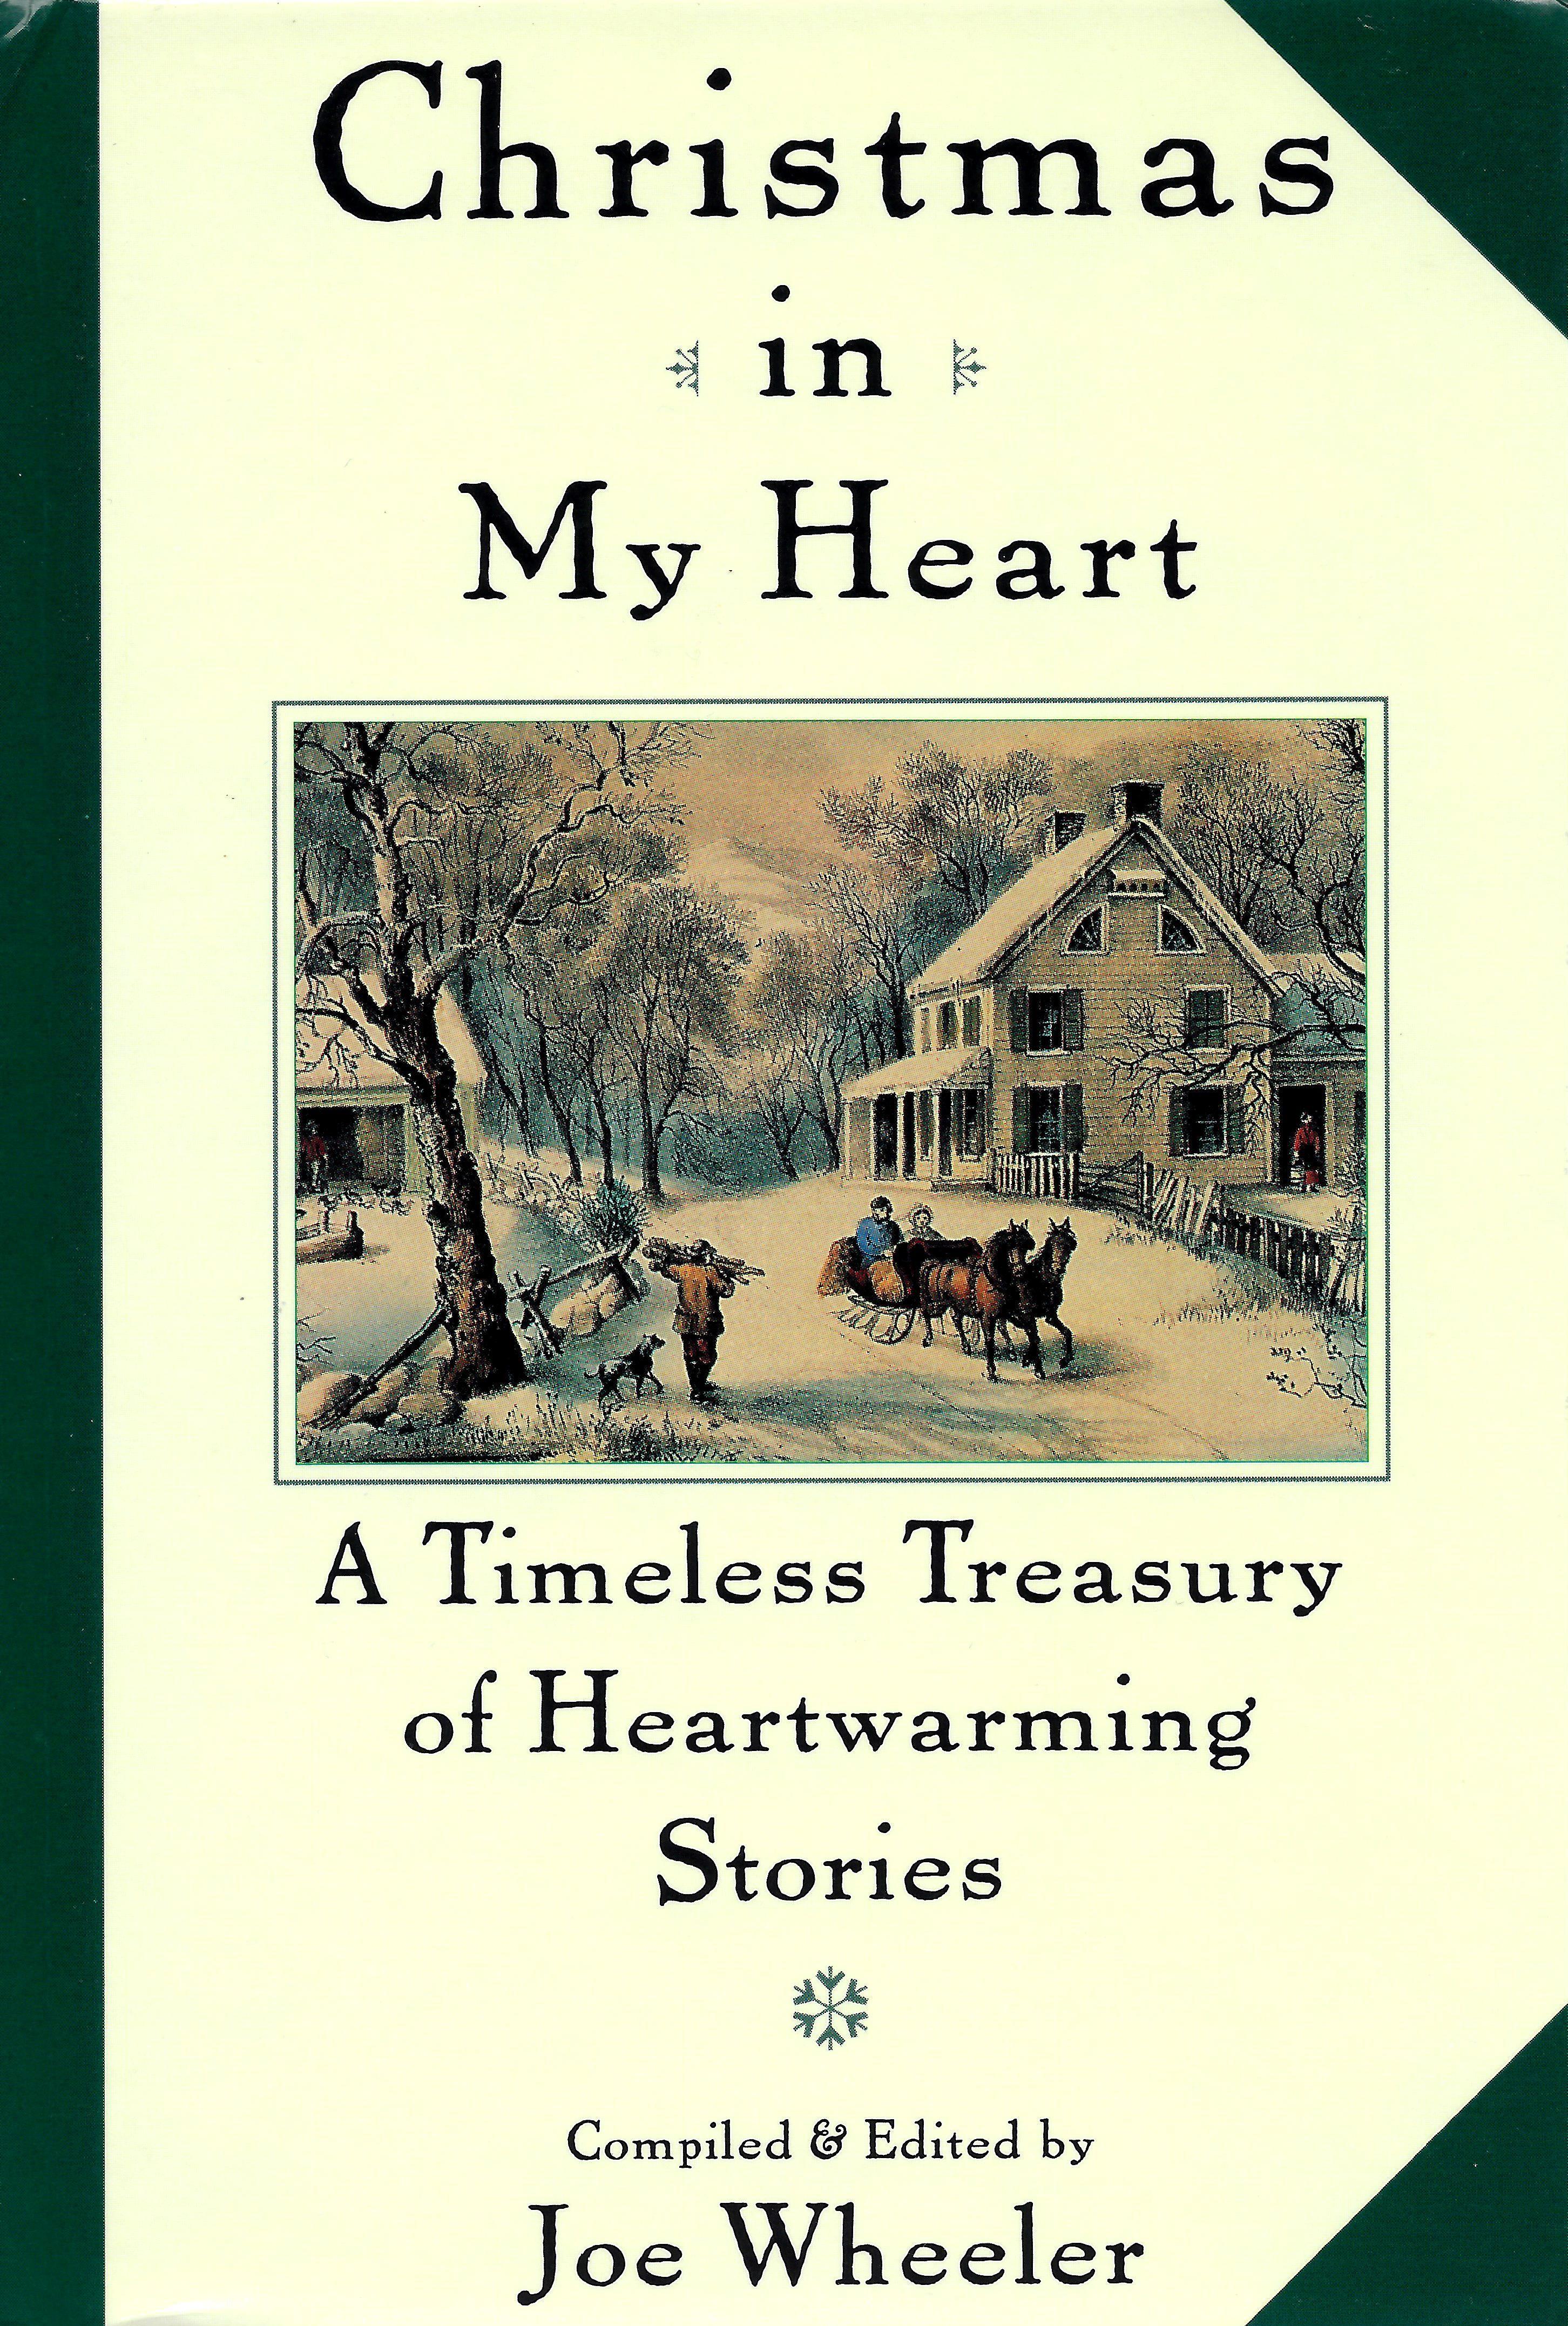 A treasury of heartwarming Christmas stories